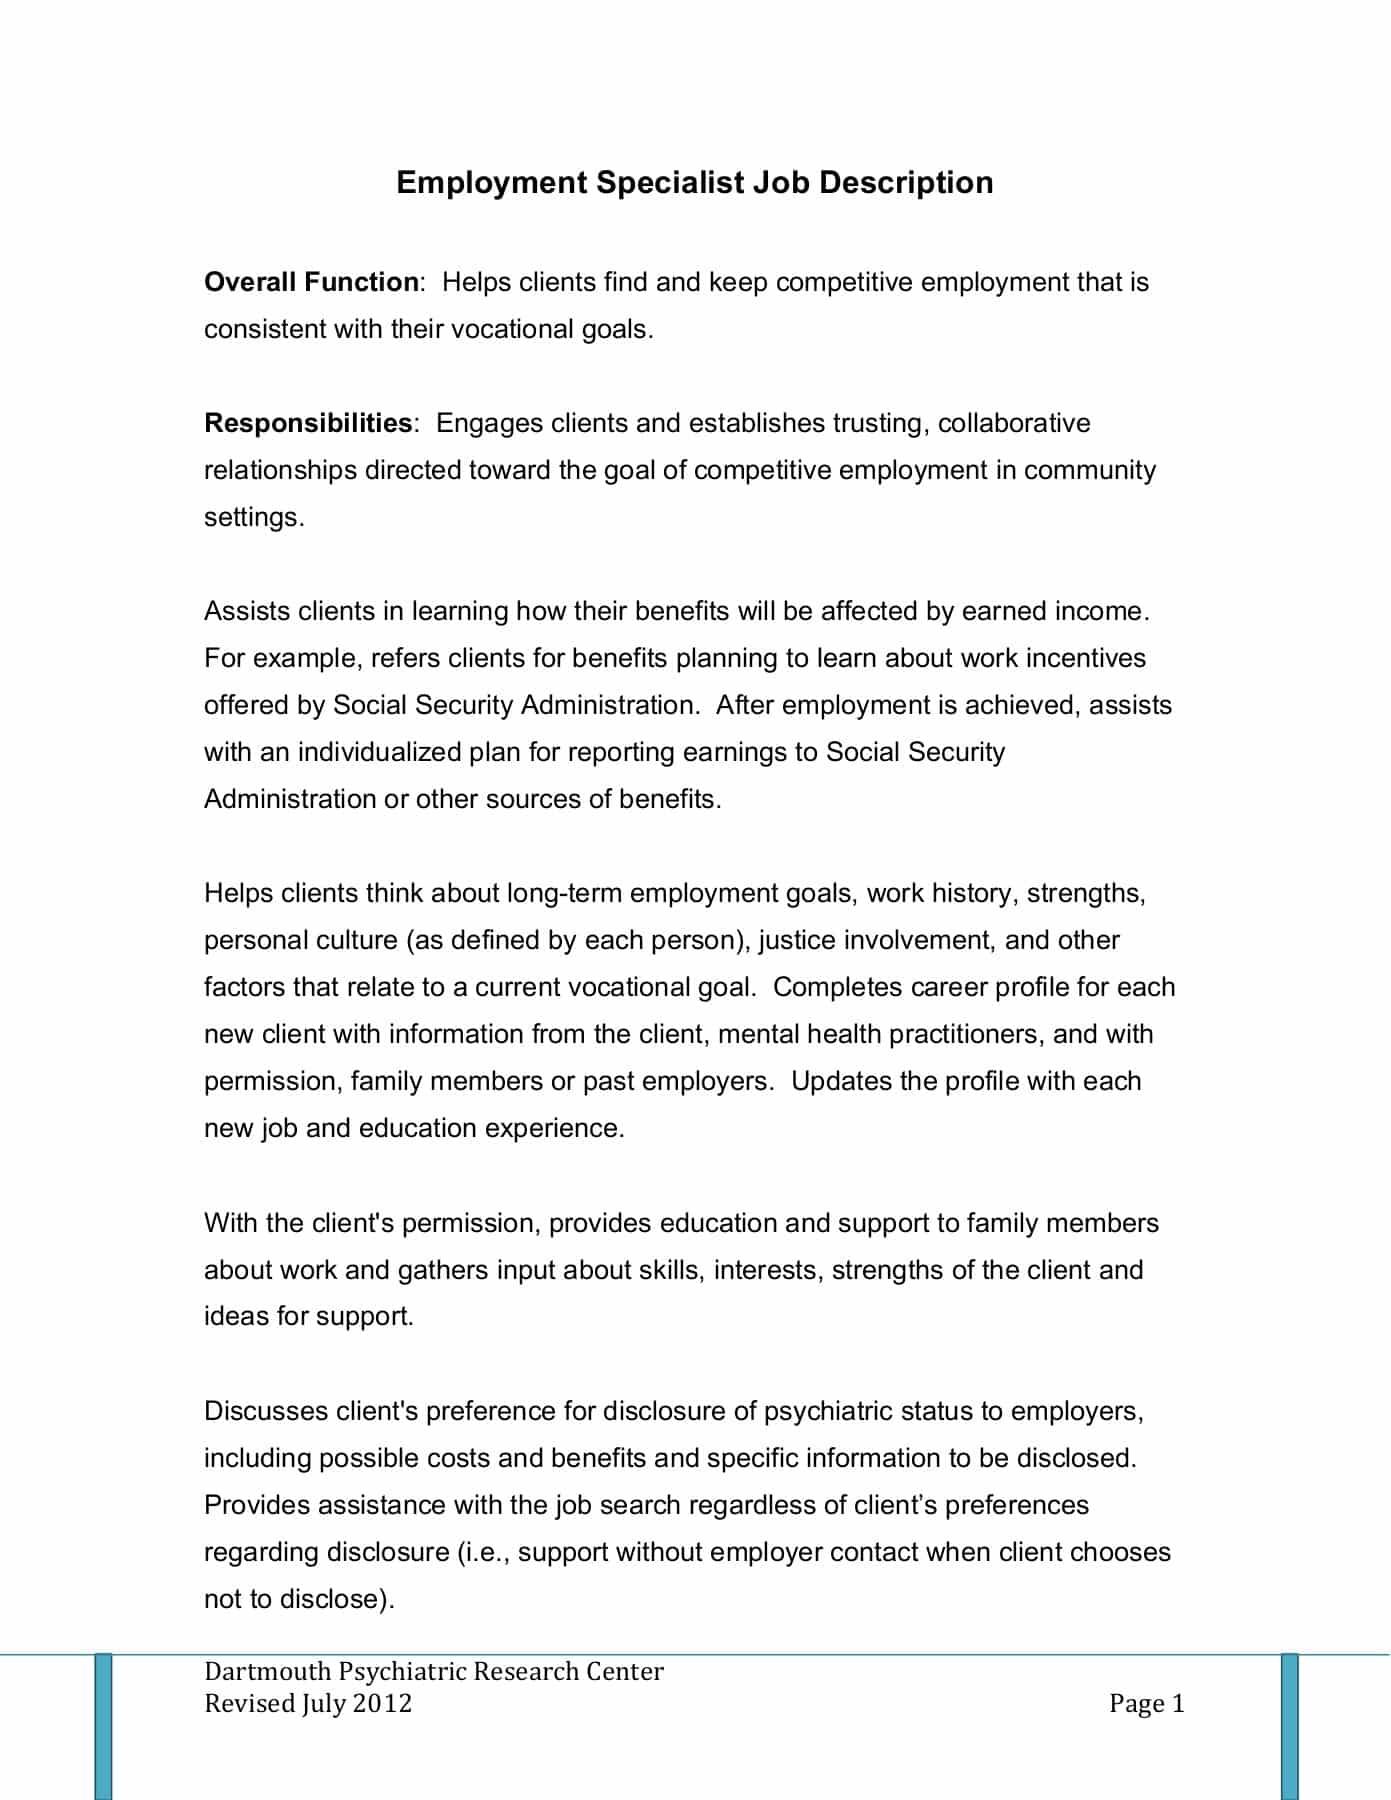 employment-specialist-job-responsibilities